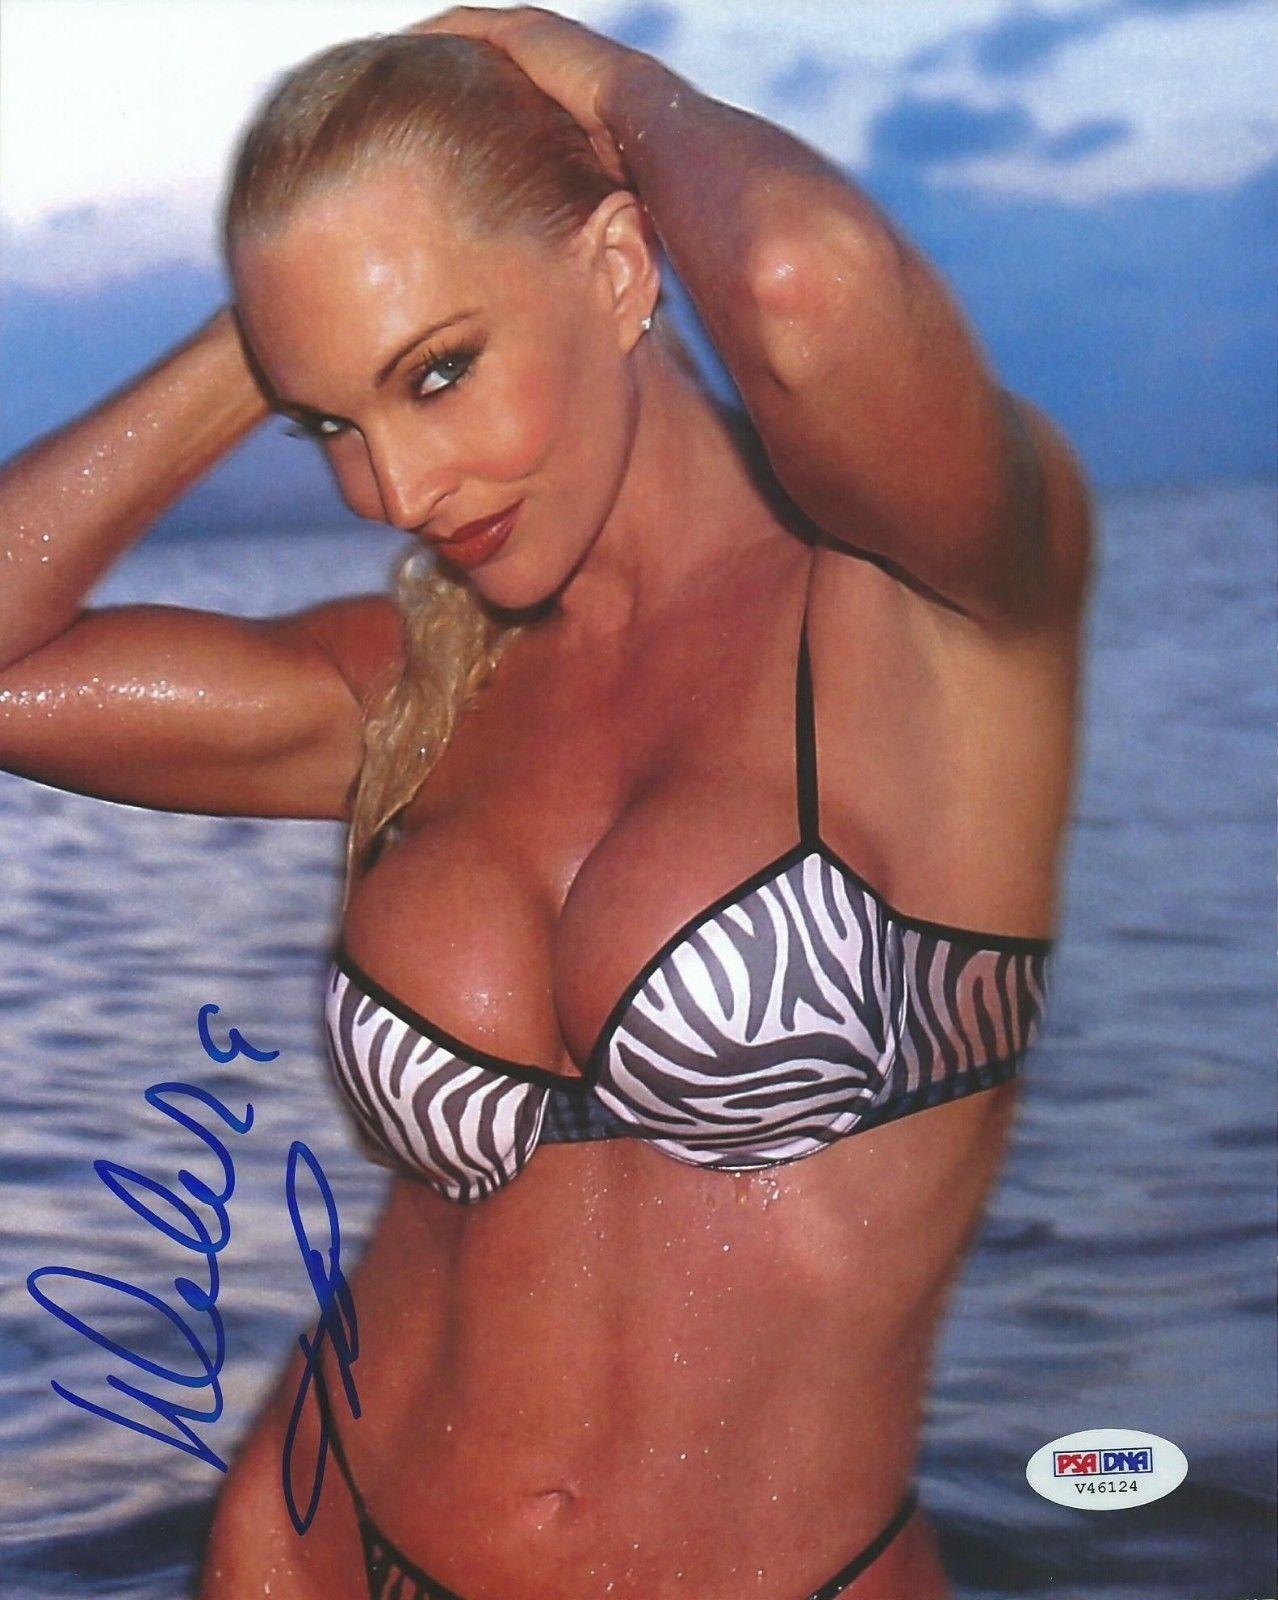 High Quality Autograph - ज़ेबरा pattern bikini